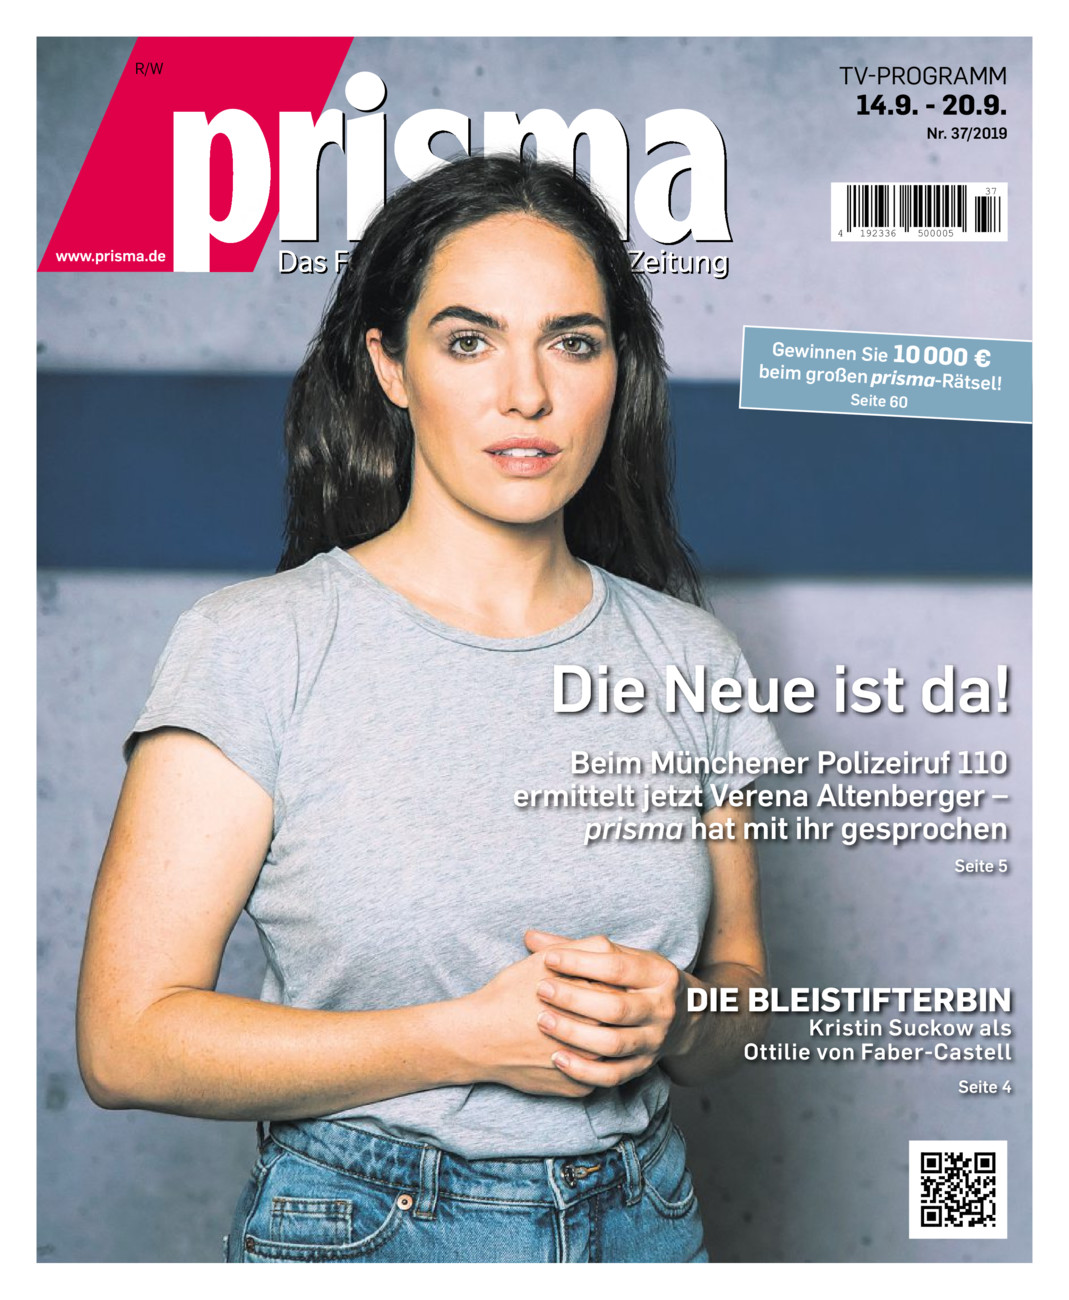 Prisma 14.09. - 20.09.